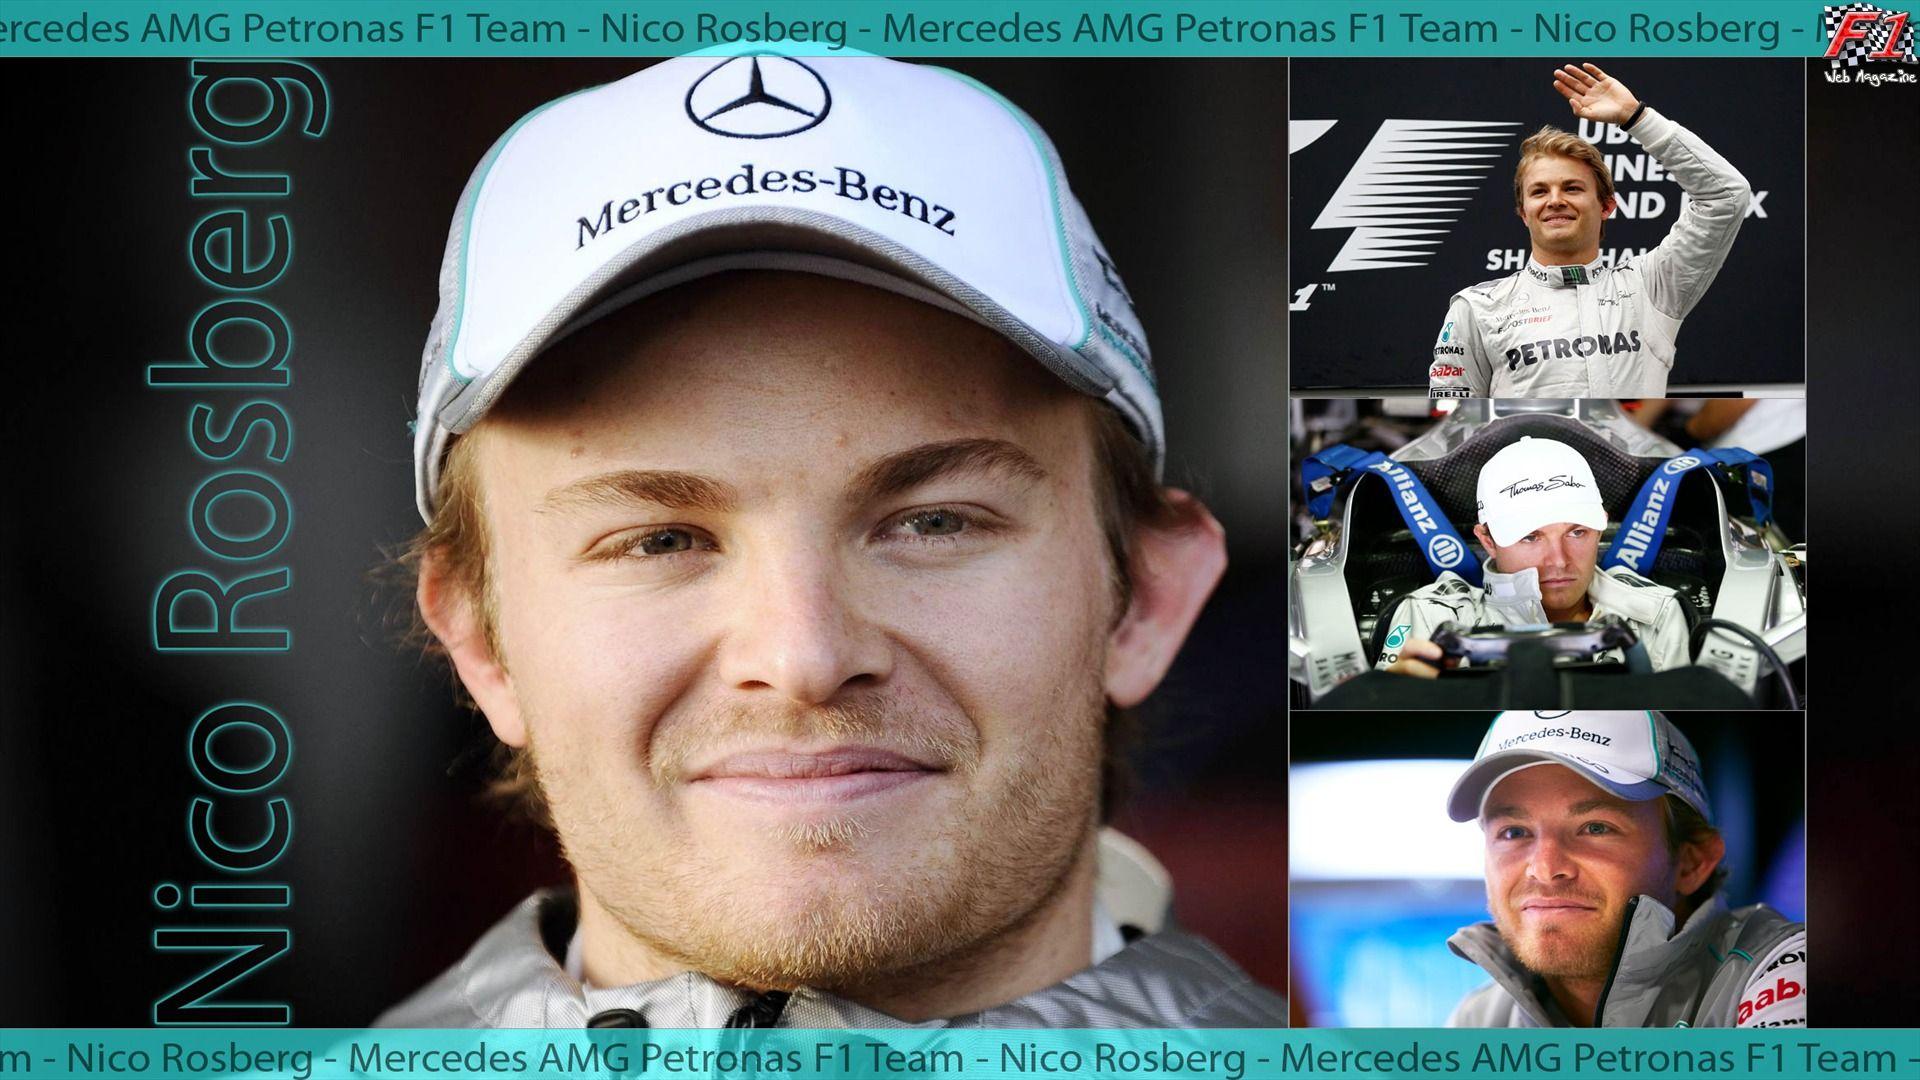 Nico Rosberg - Mercedes AMG Petronas F1 Team -